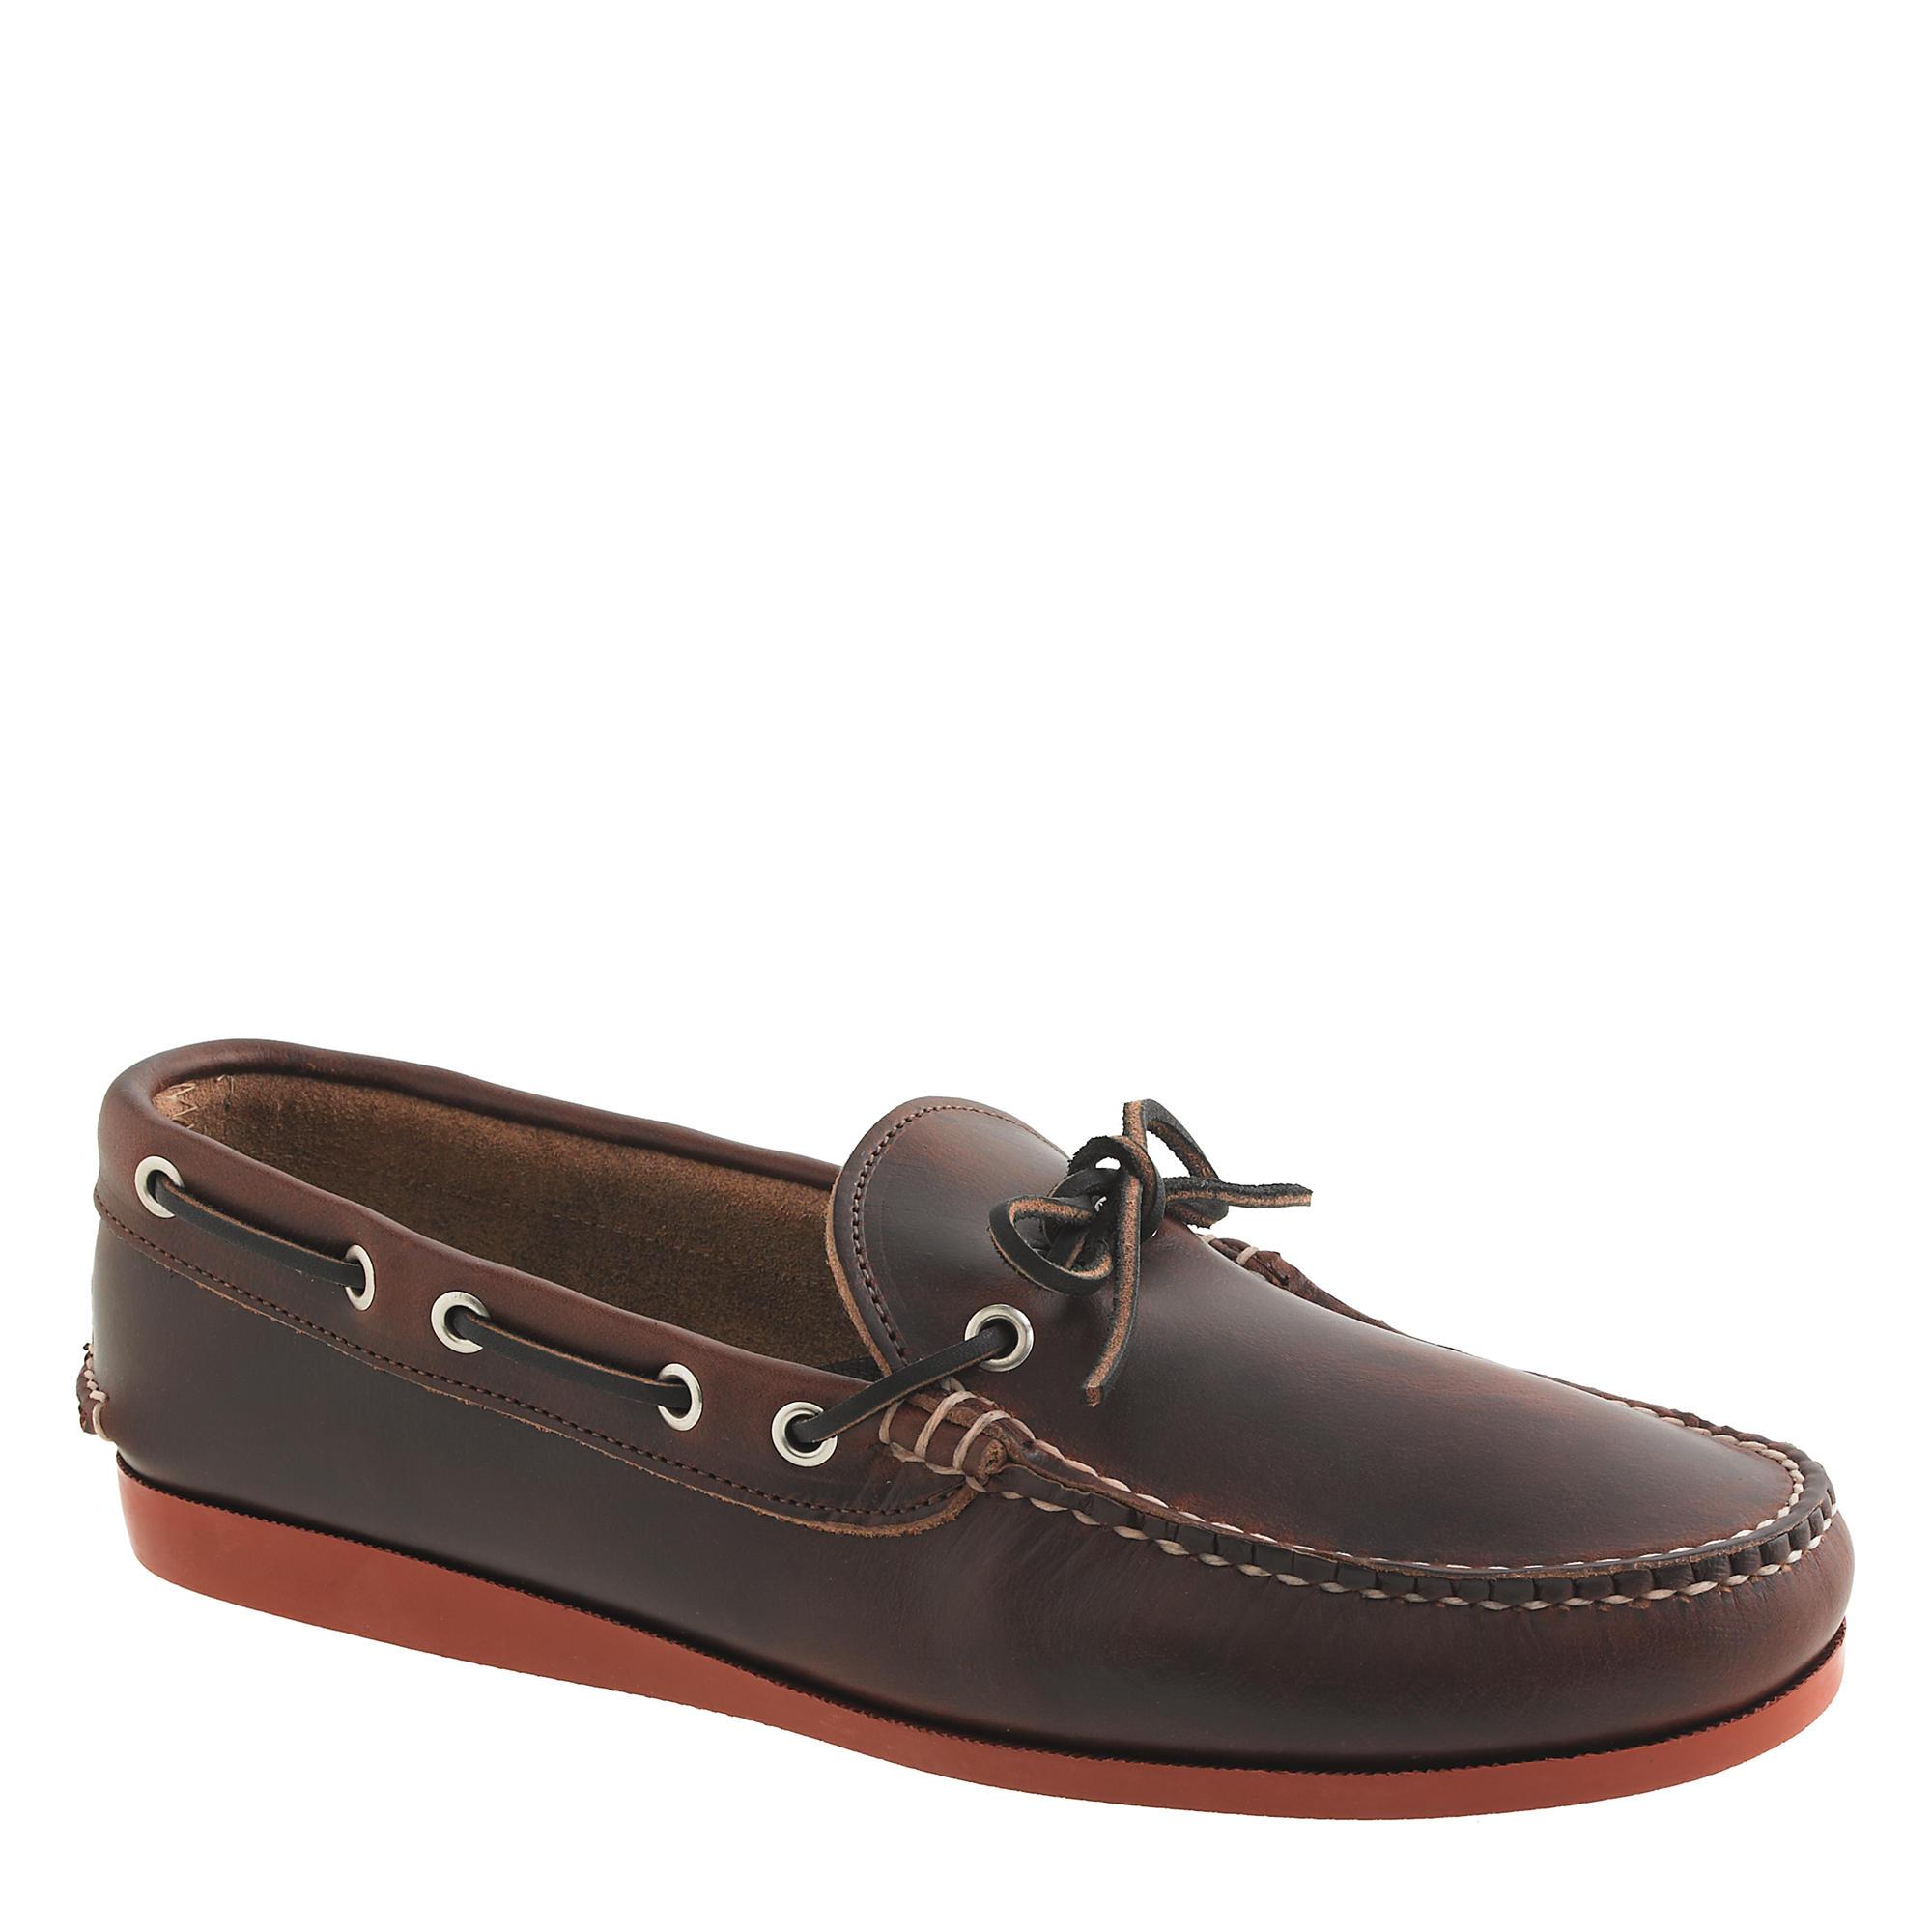 Leather Canoe Shoes